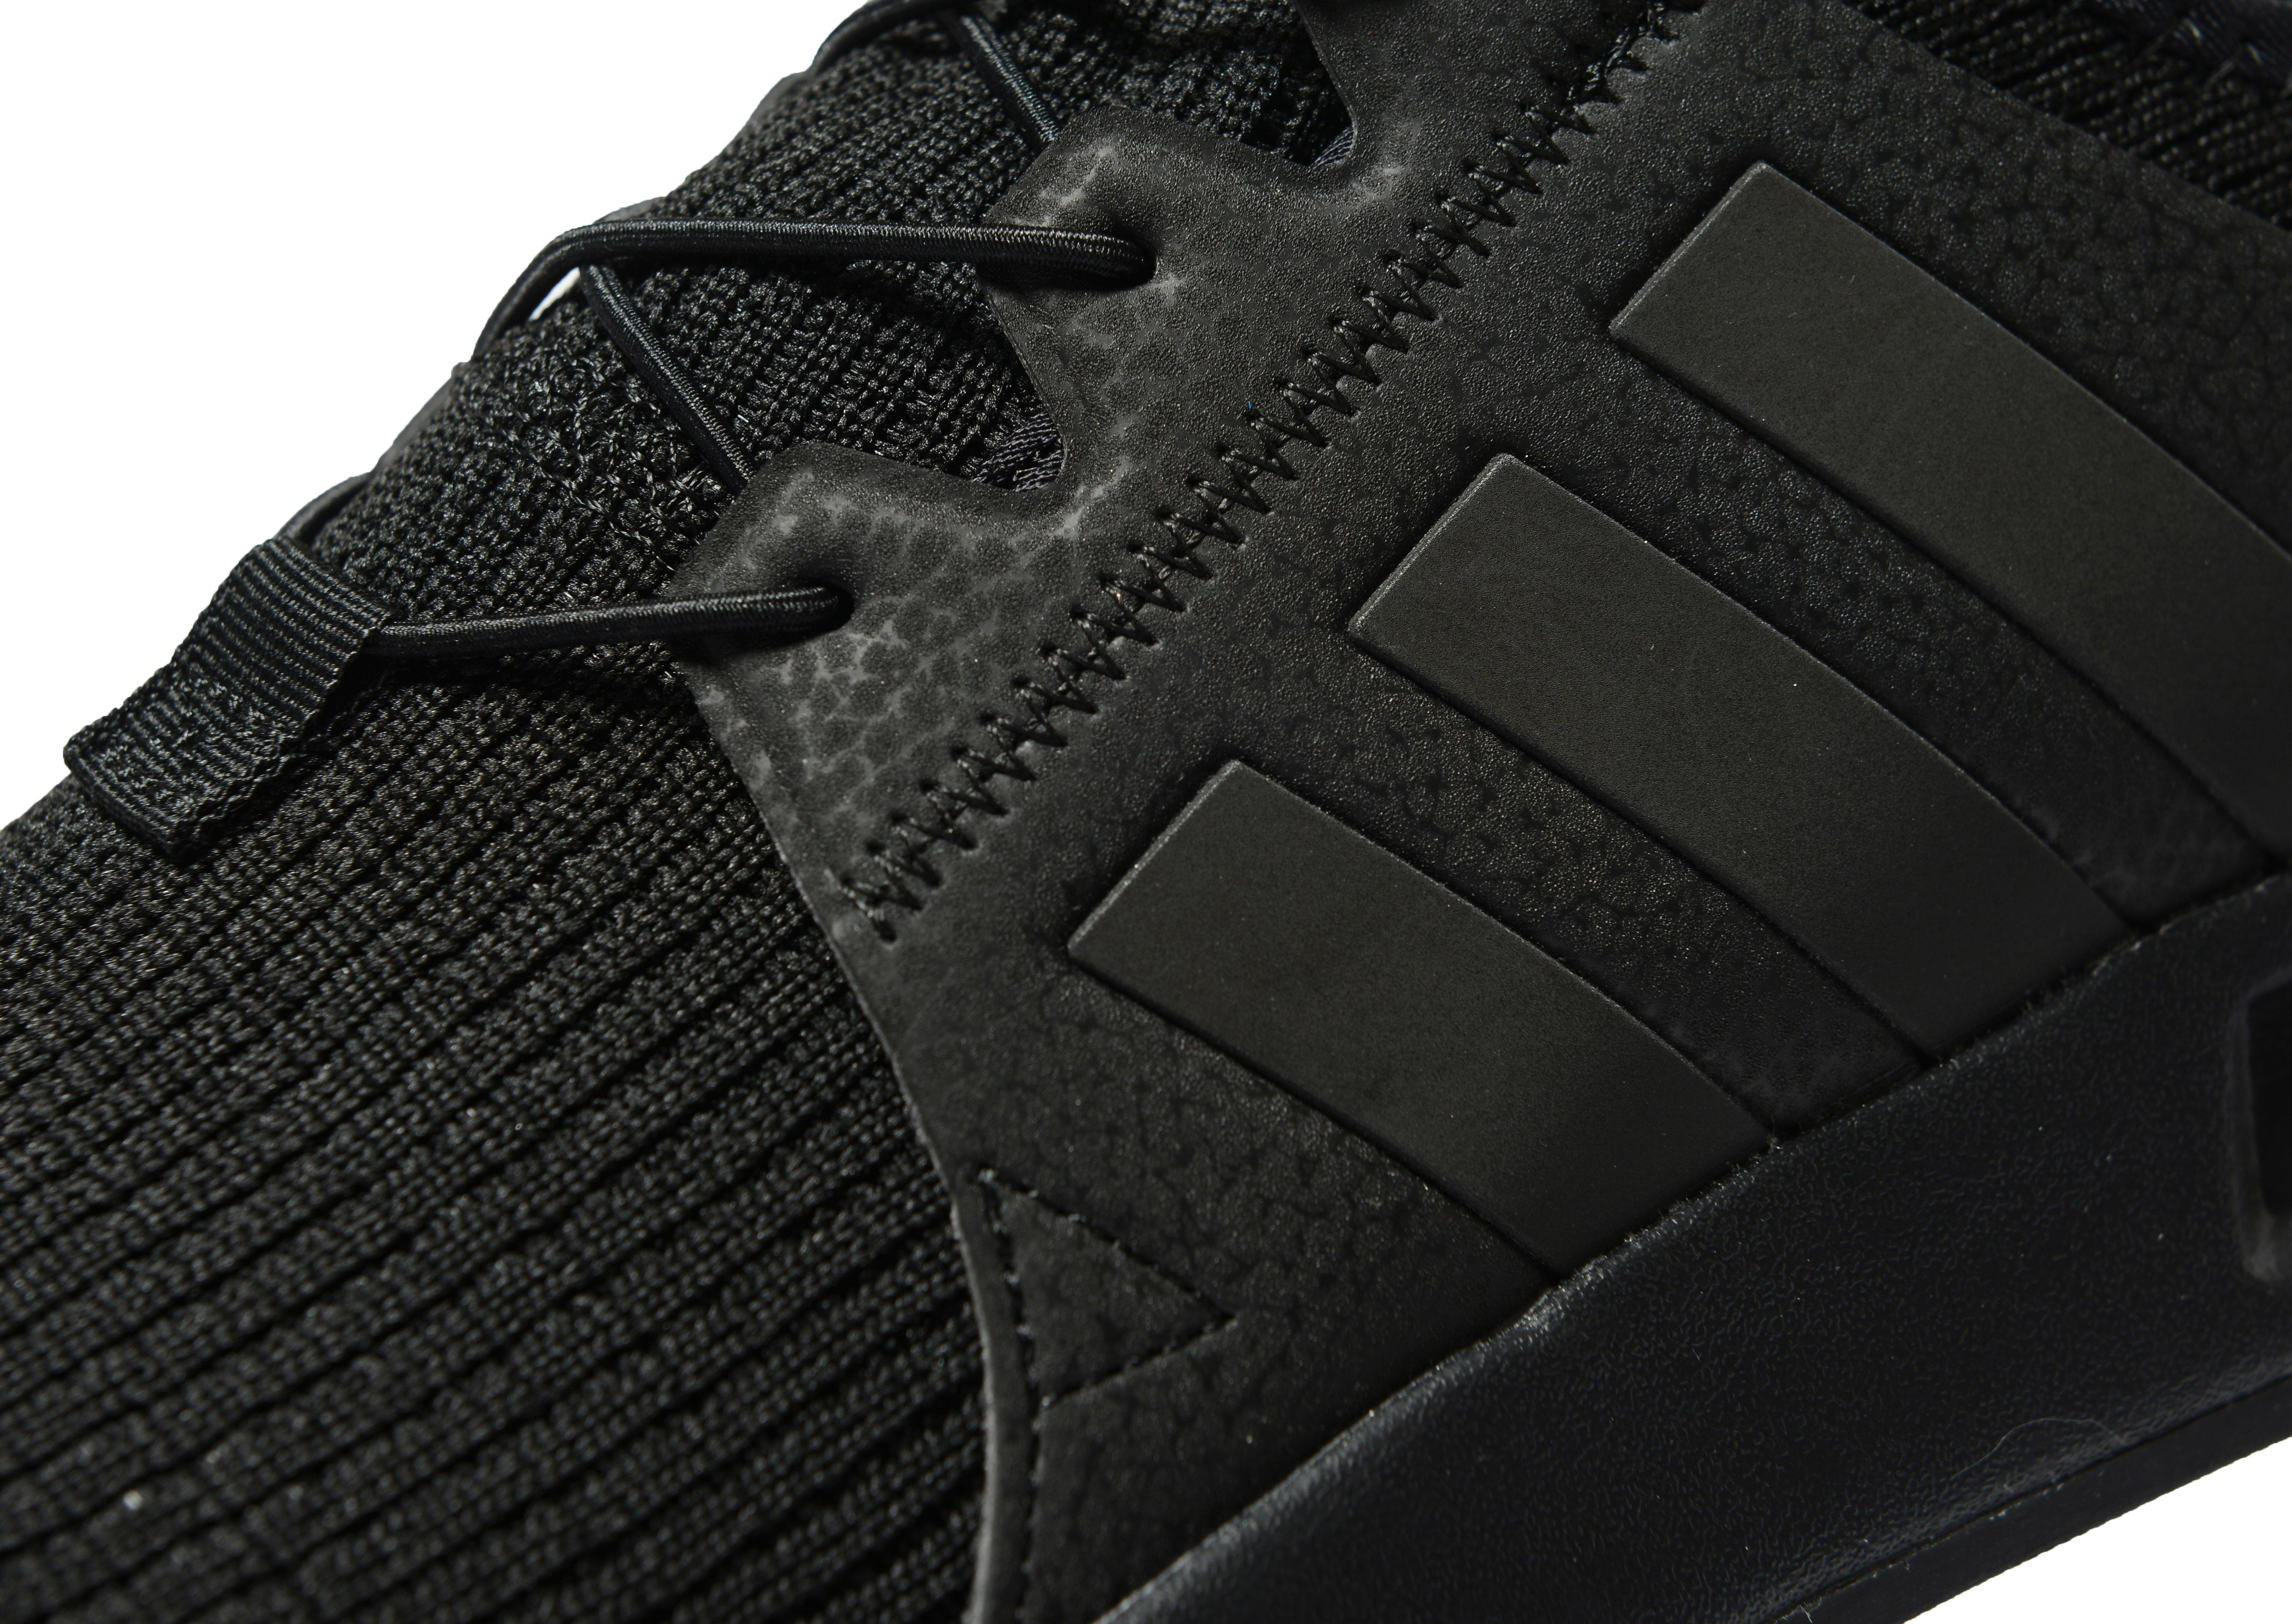 Adidas Originals Xplr Circular Knit in Black for Men - Lyst 24a95aba6